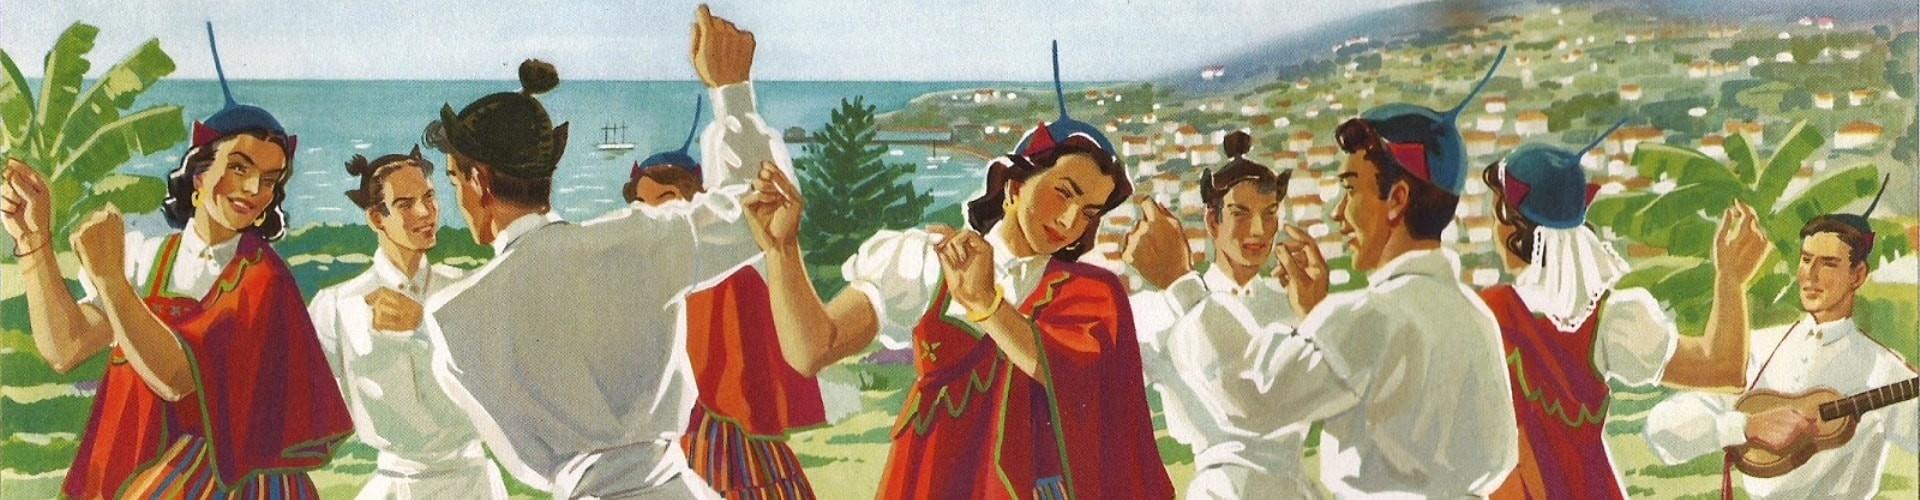 Madeira Island Culture